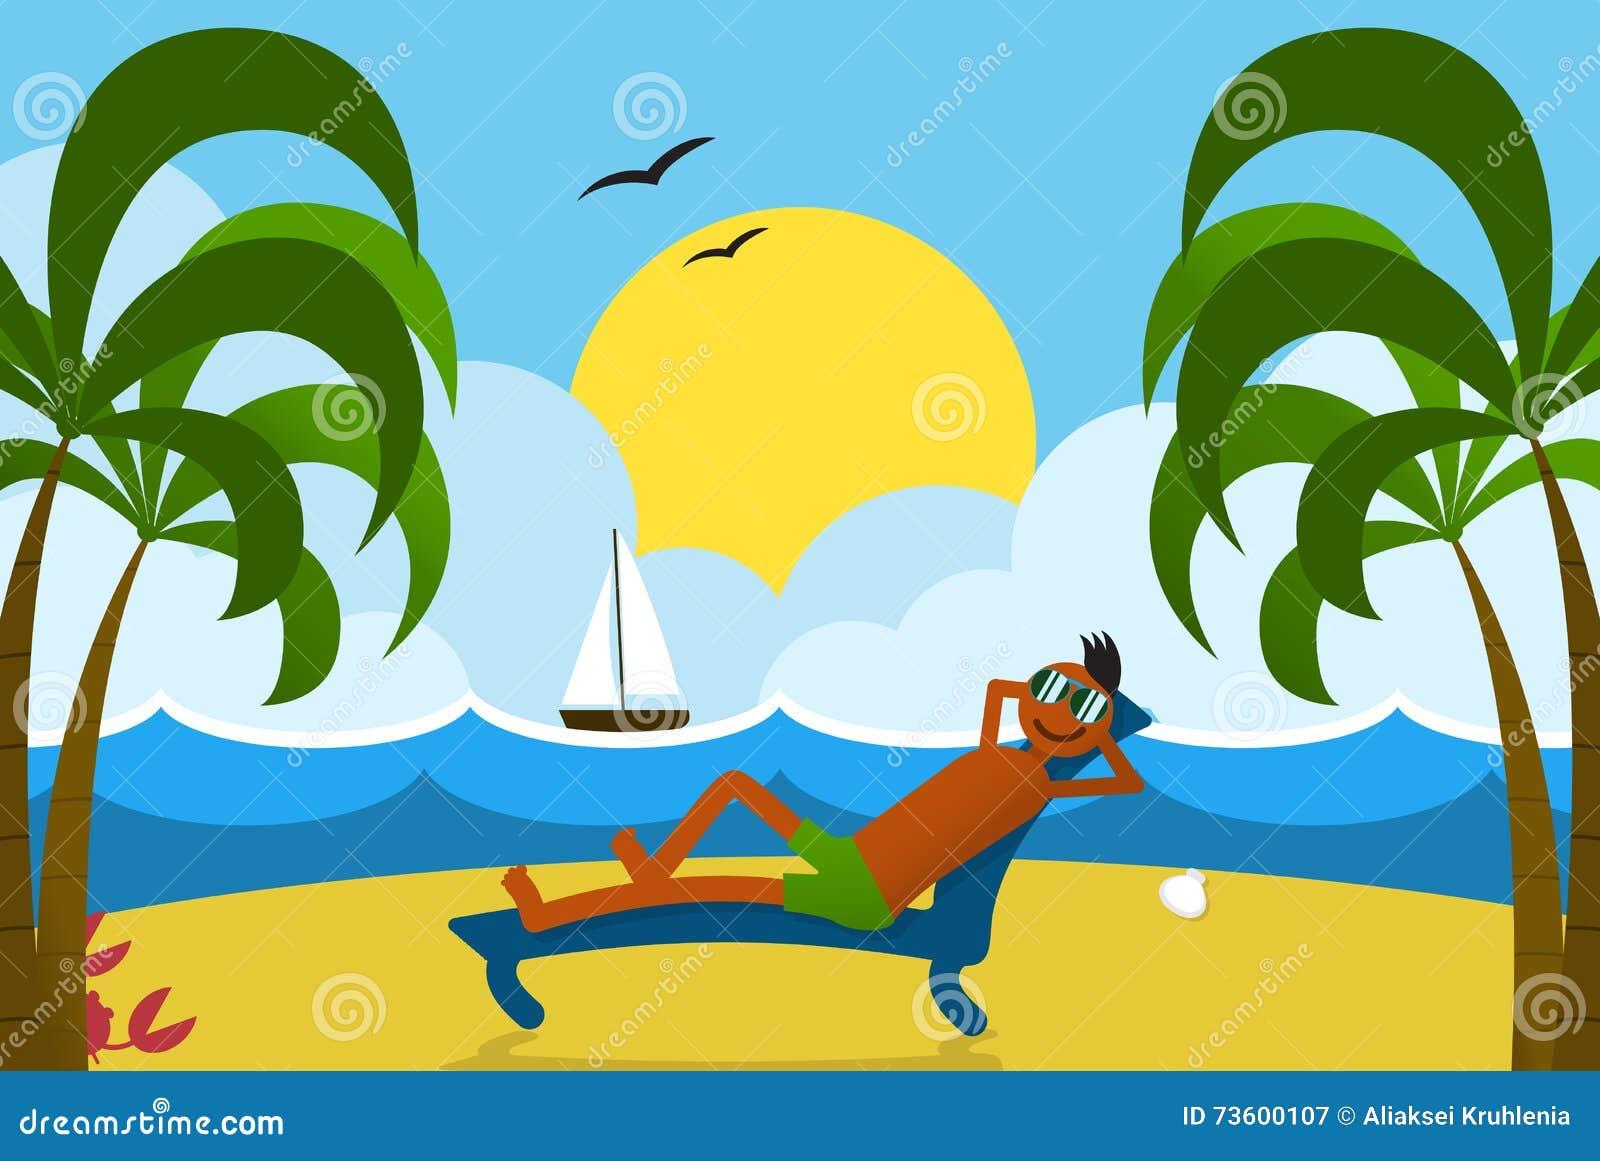 lounging man on beach stock vector image 73600107 beach chair clip art free beach chair clip art templates